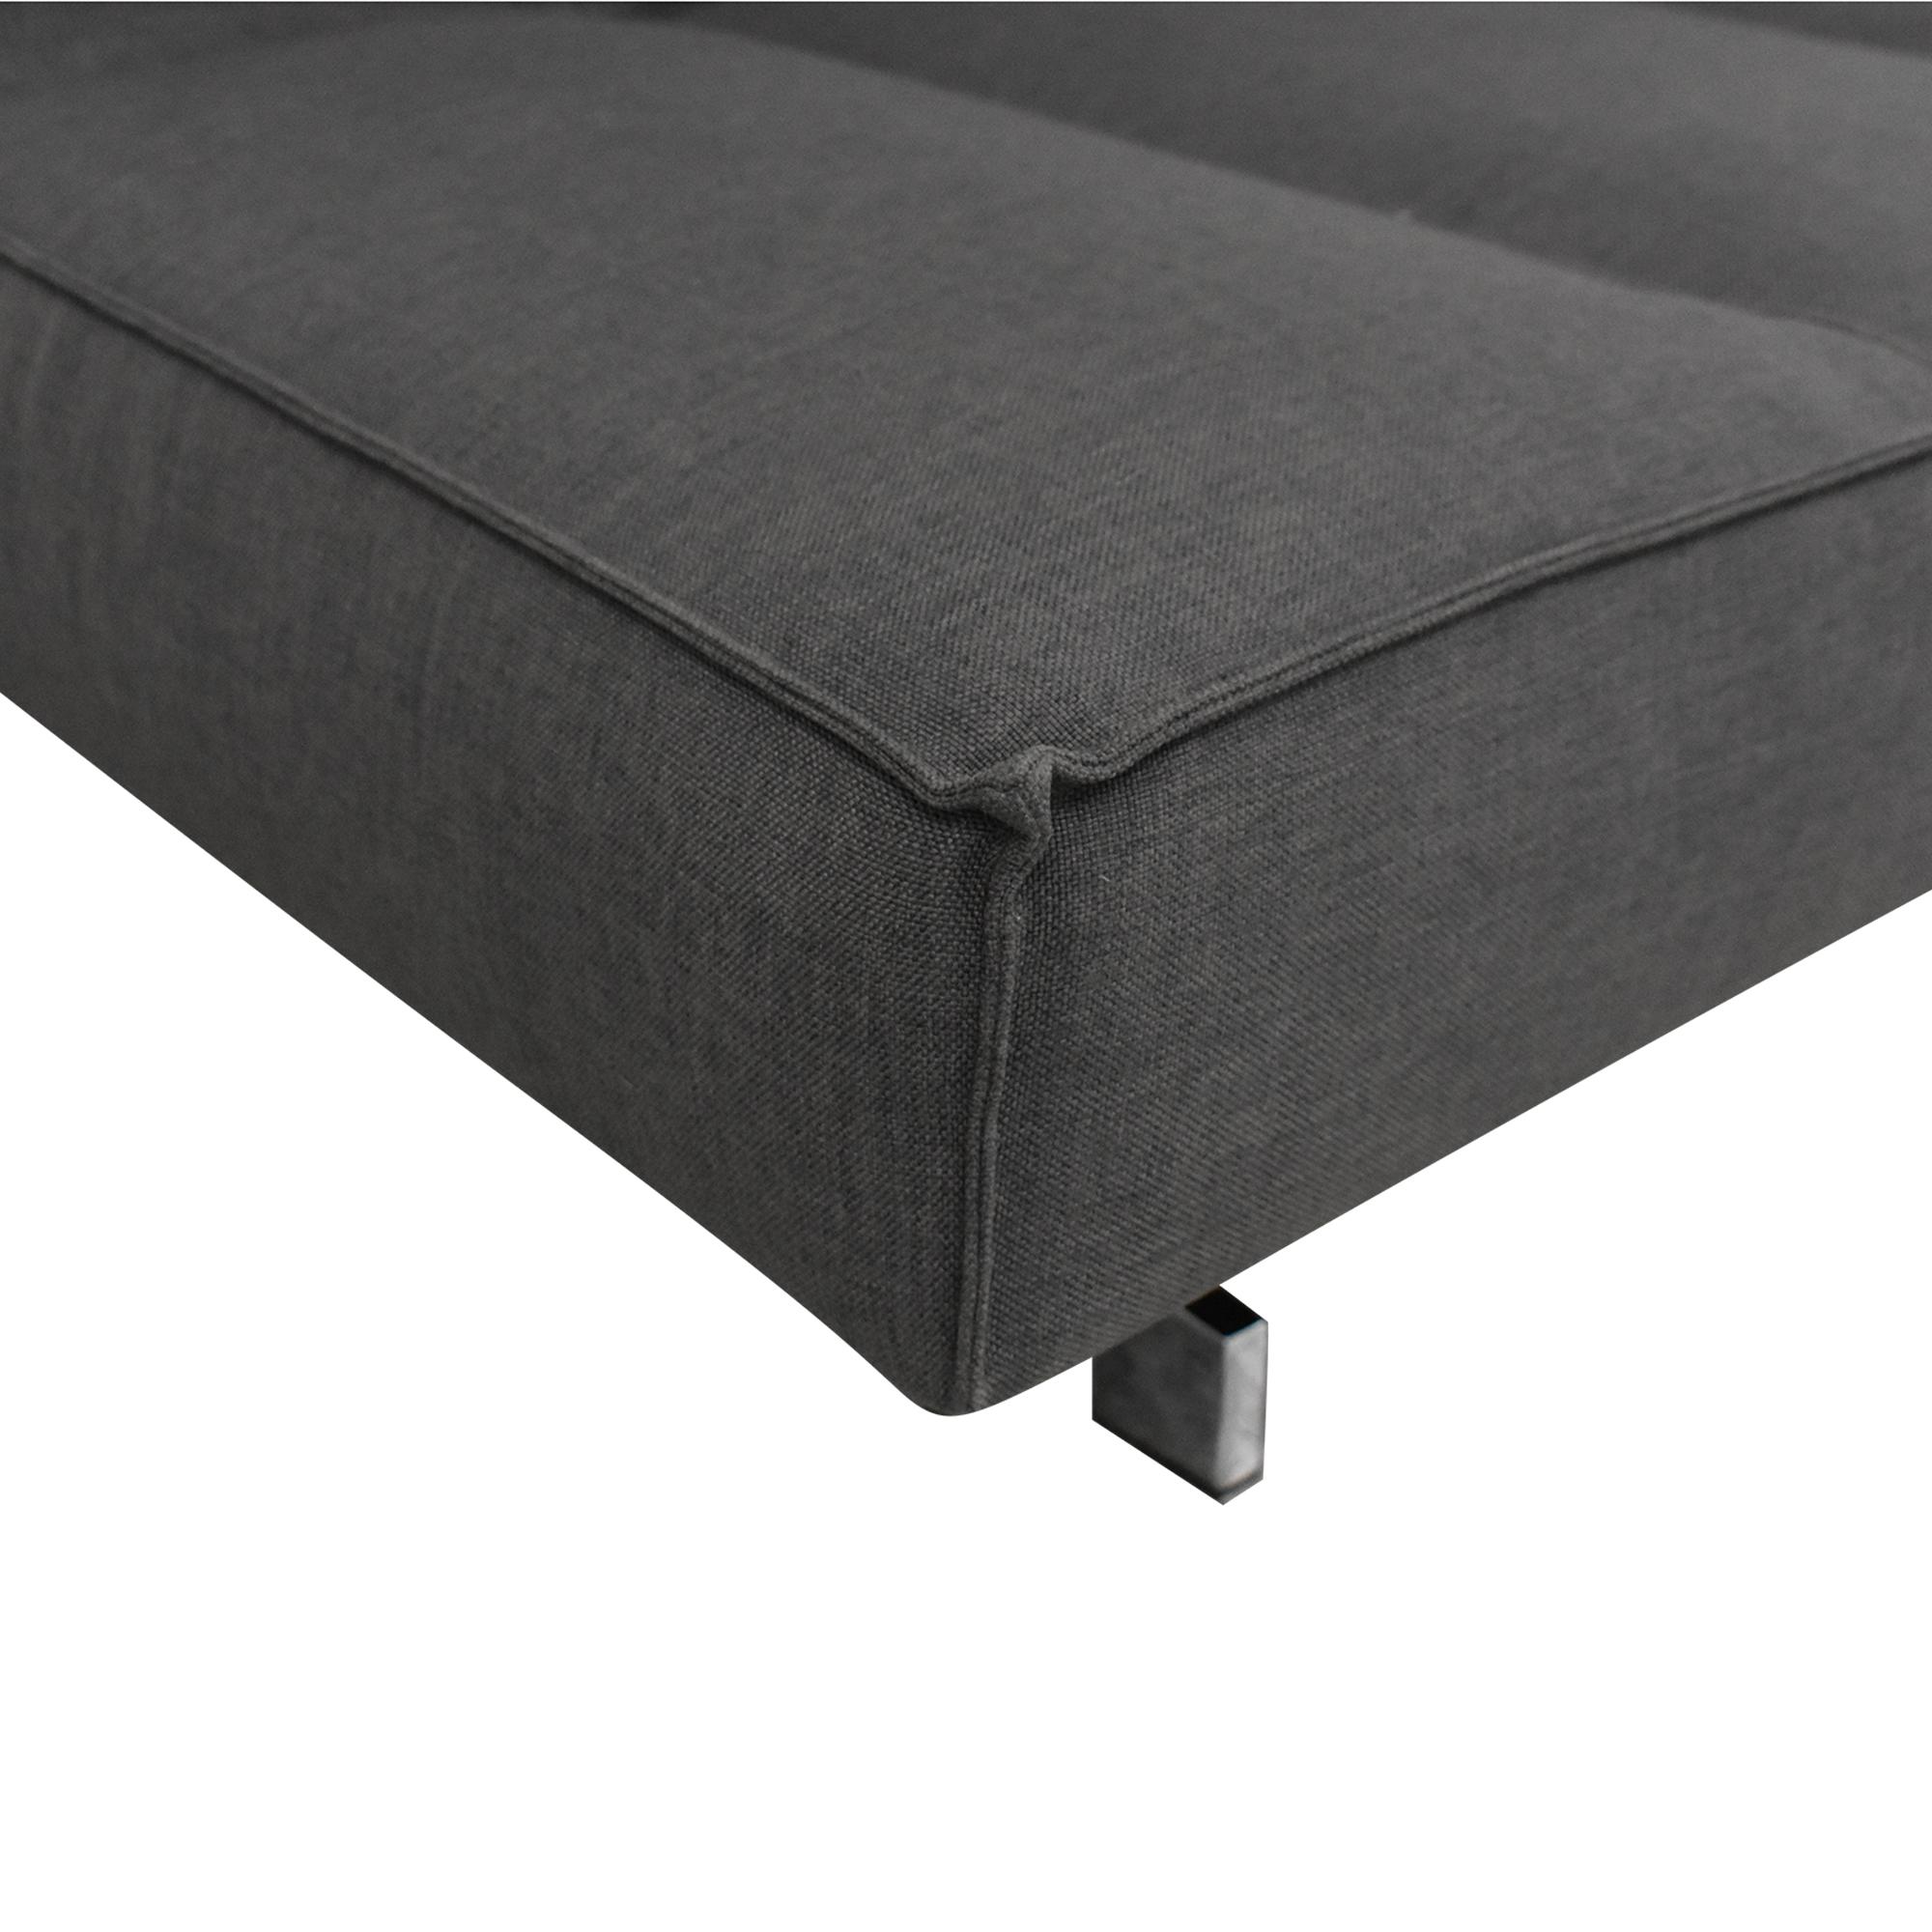 CB2 CB2 Flex Sleeper Sofa dimensions